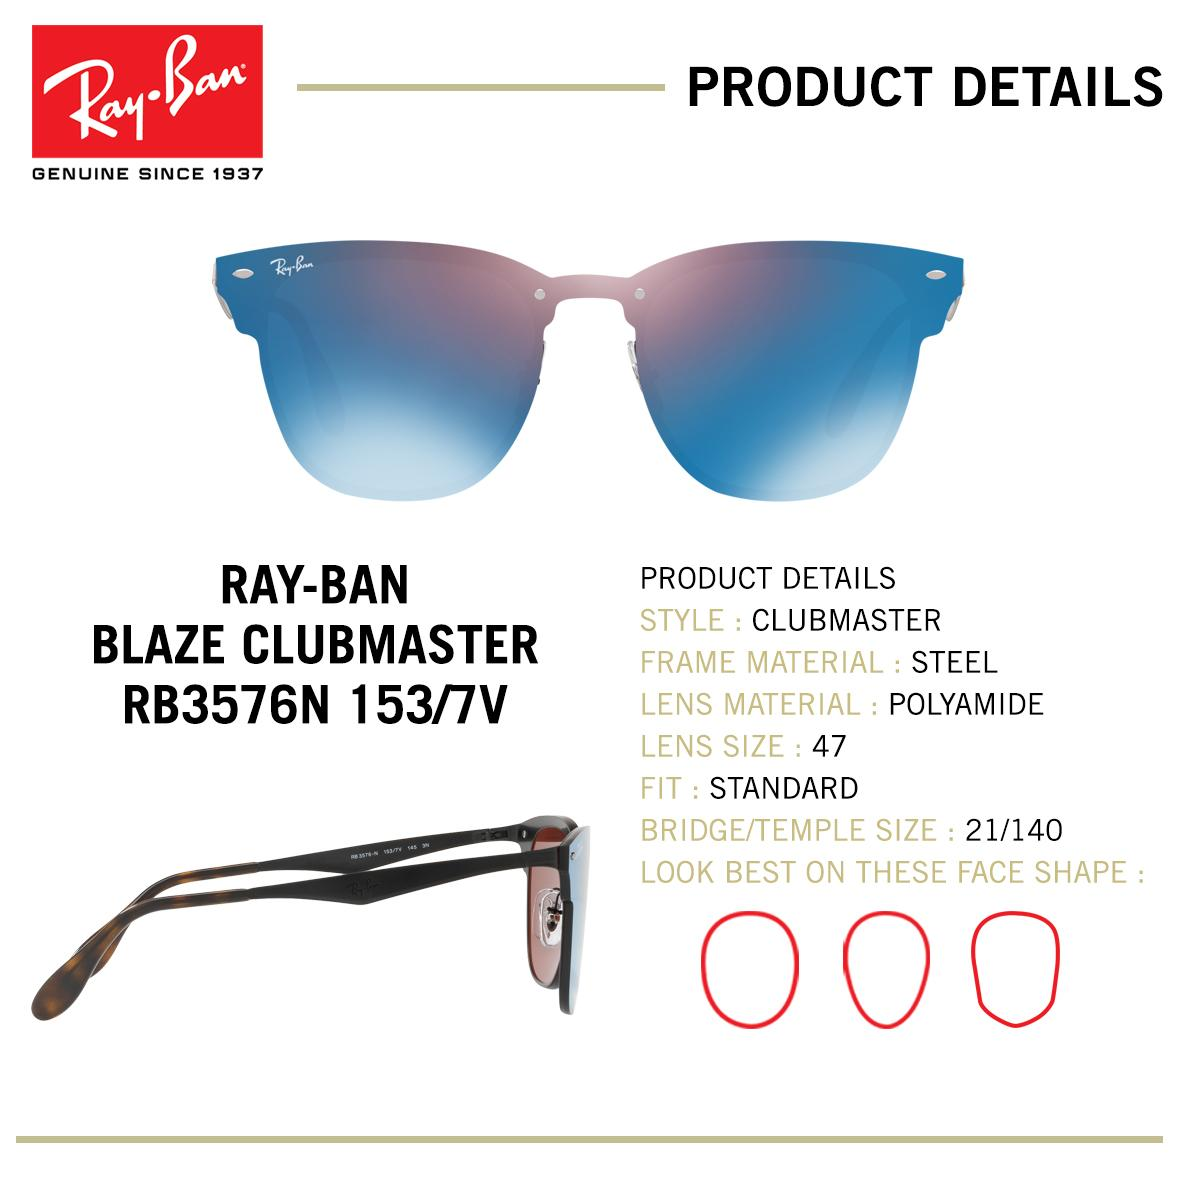 a3bcef67fb Ray-Ban Sunglasses Blaze Clubmaster - RB3576N 153 7V - size 47